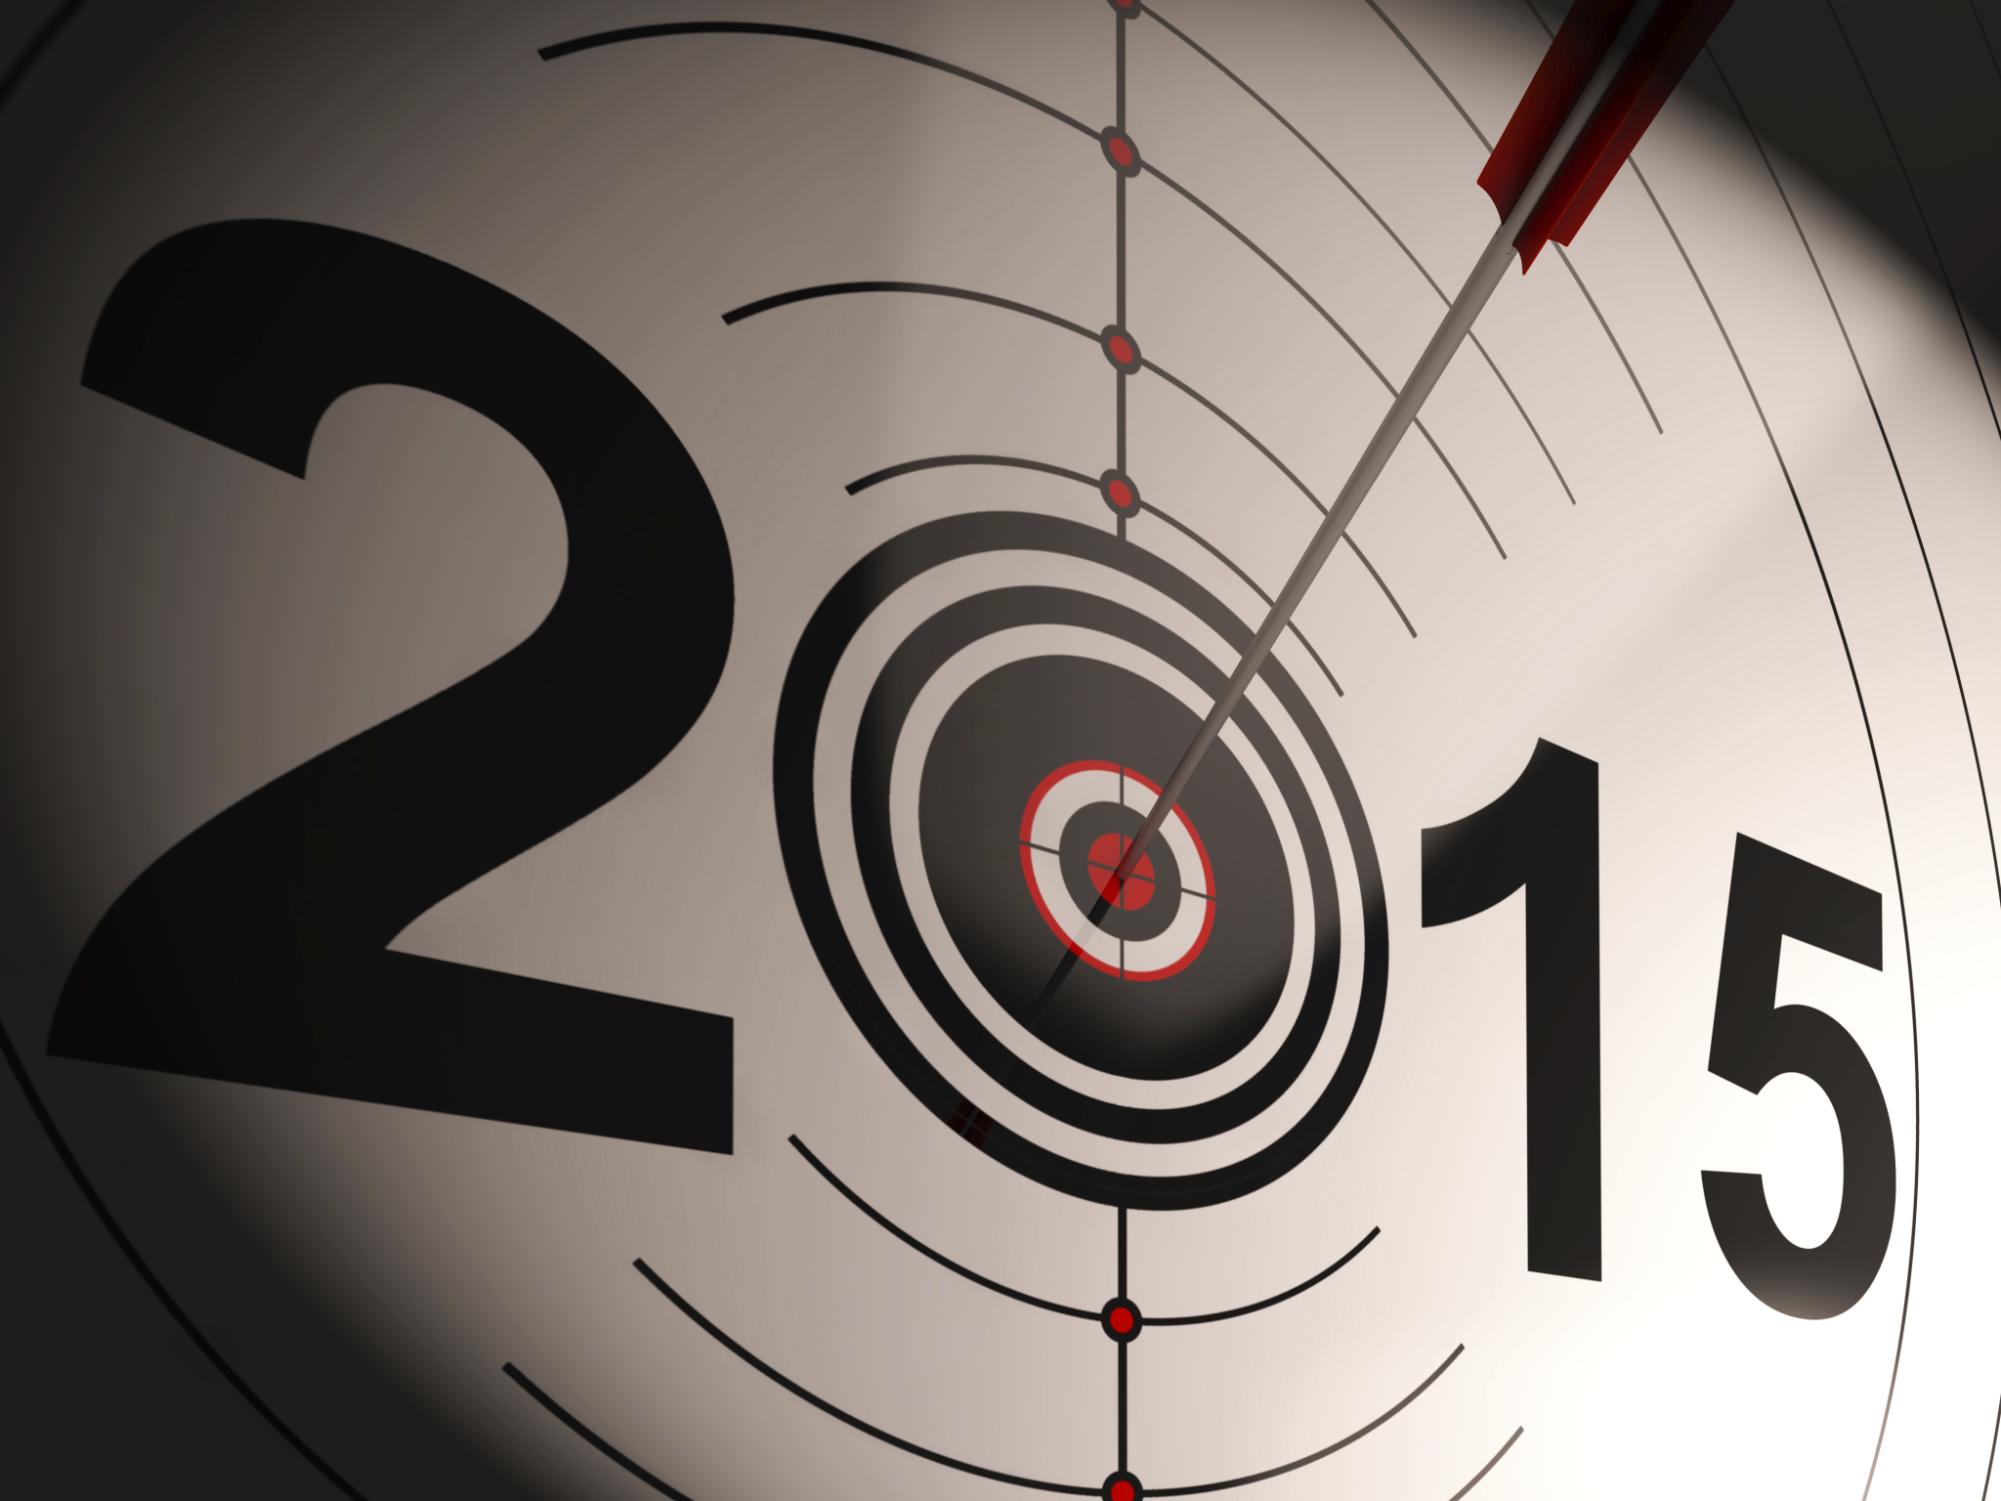 3 Steps To Crush 2015